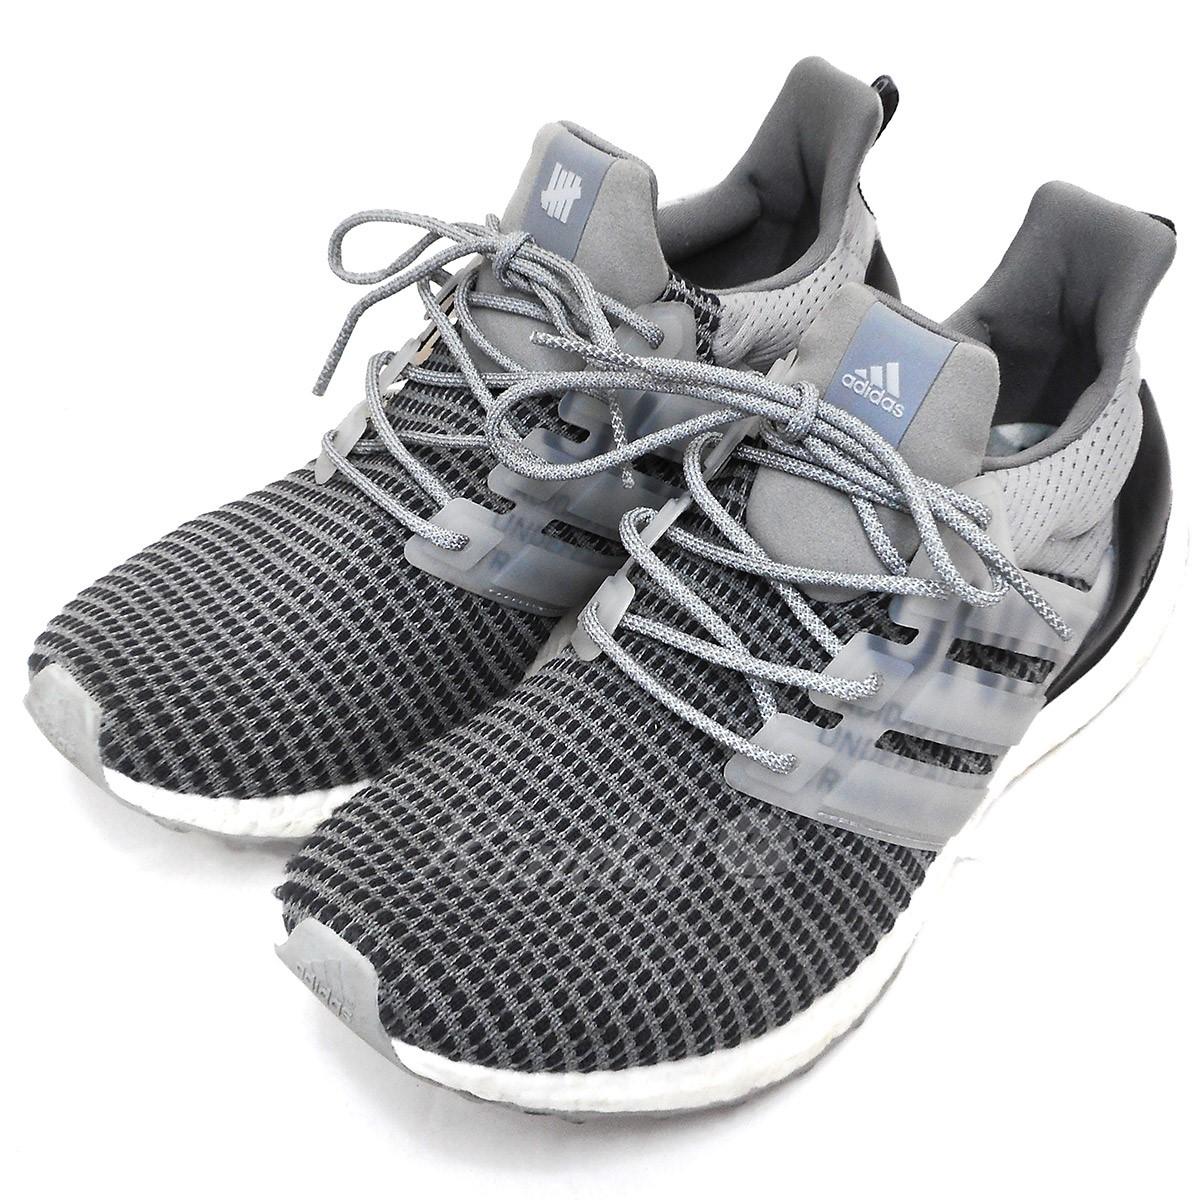 【中古】adidas ULTRABOOST UNDFTD 【送料無料】 【008763】 【KIND1551】